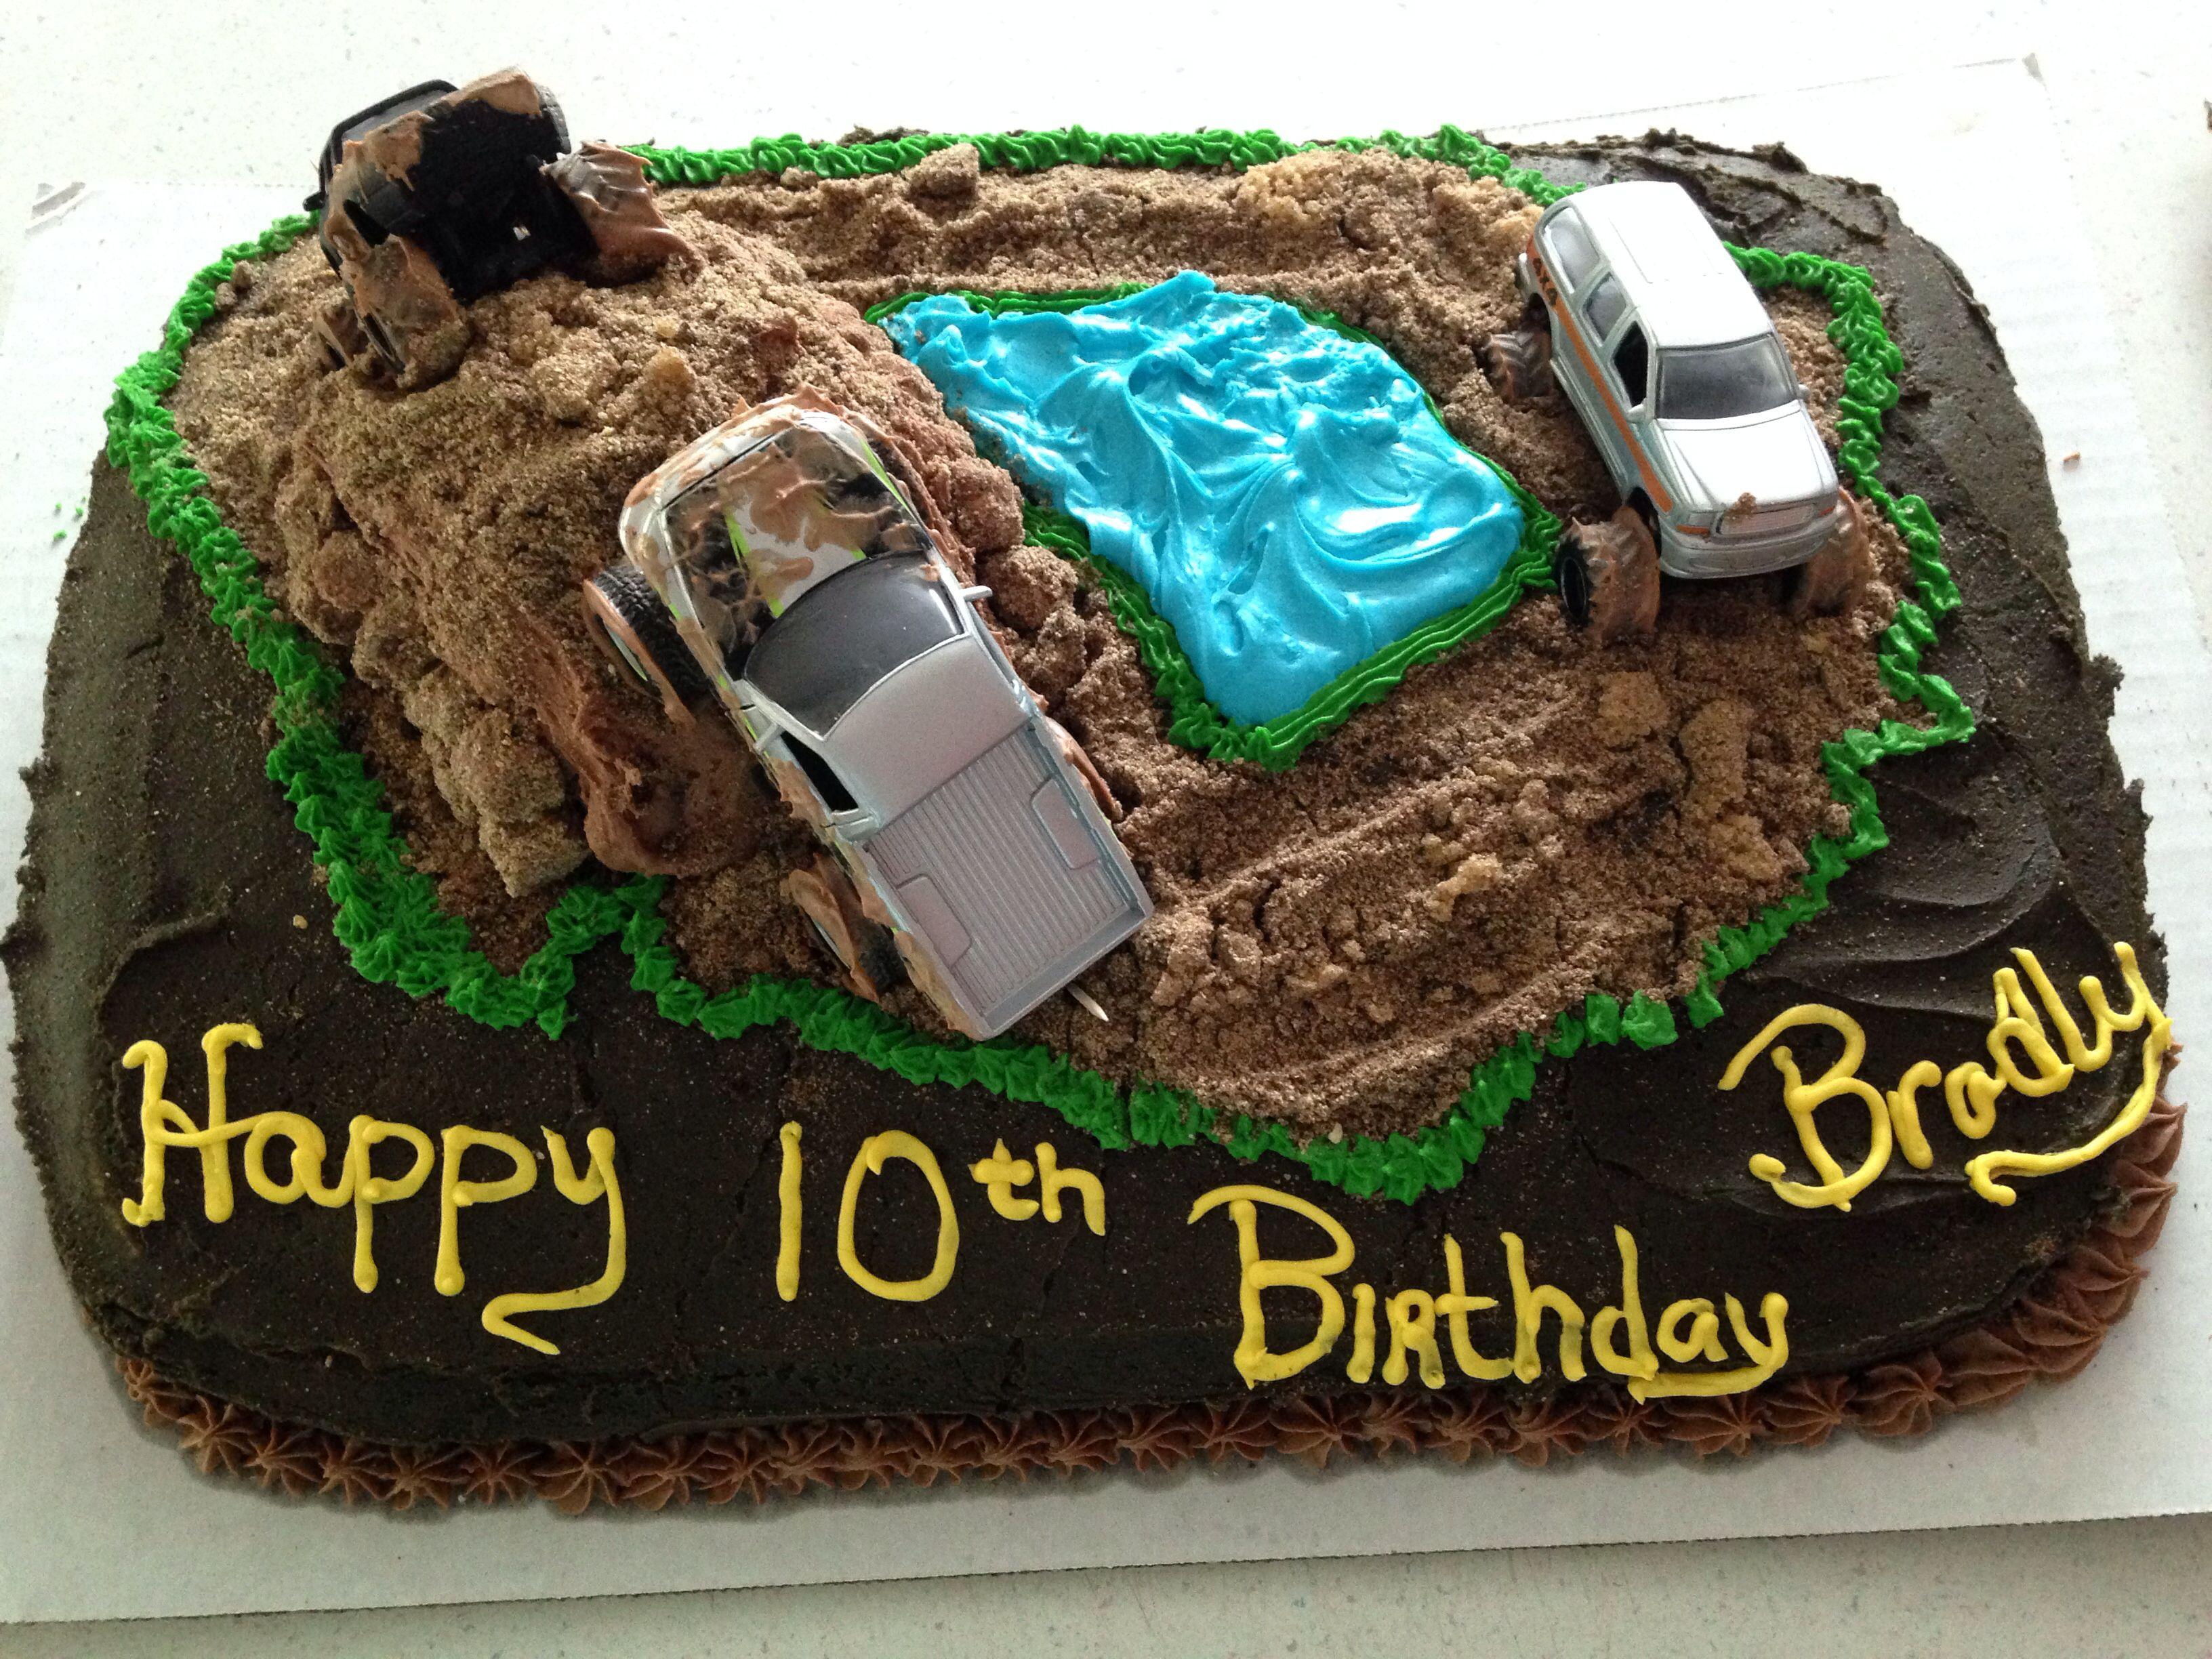 Marvelous Bradlys Mud Truck Cake With Images Truck Cakes Cake Food Personalised Birthday Cards Sponlily Jamesorg